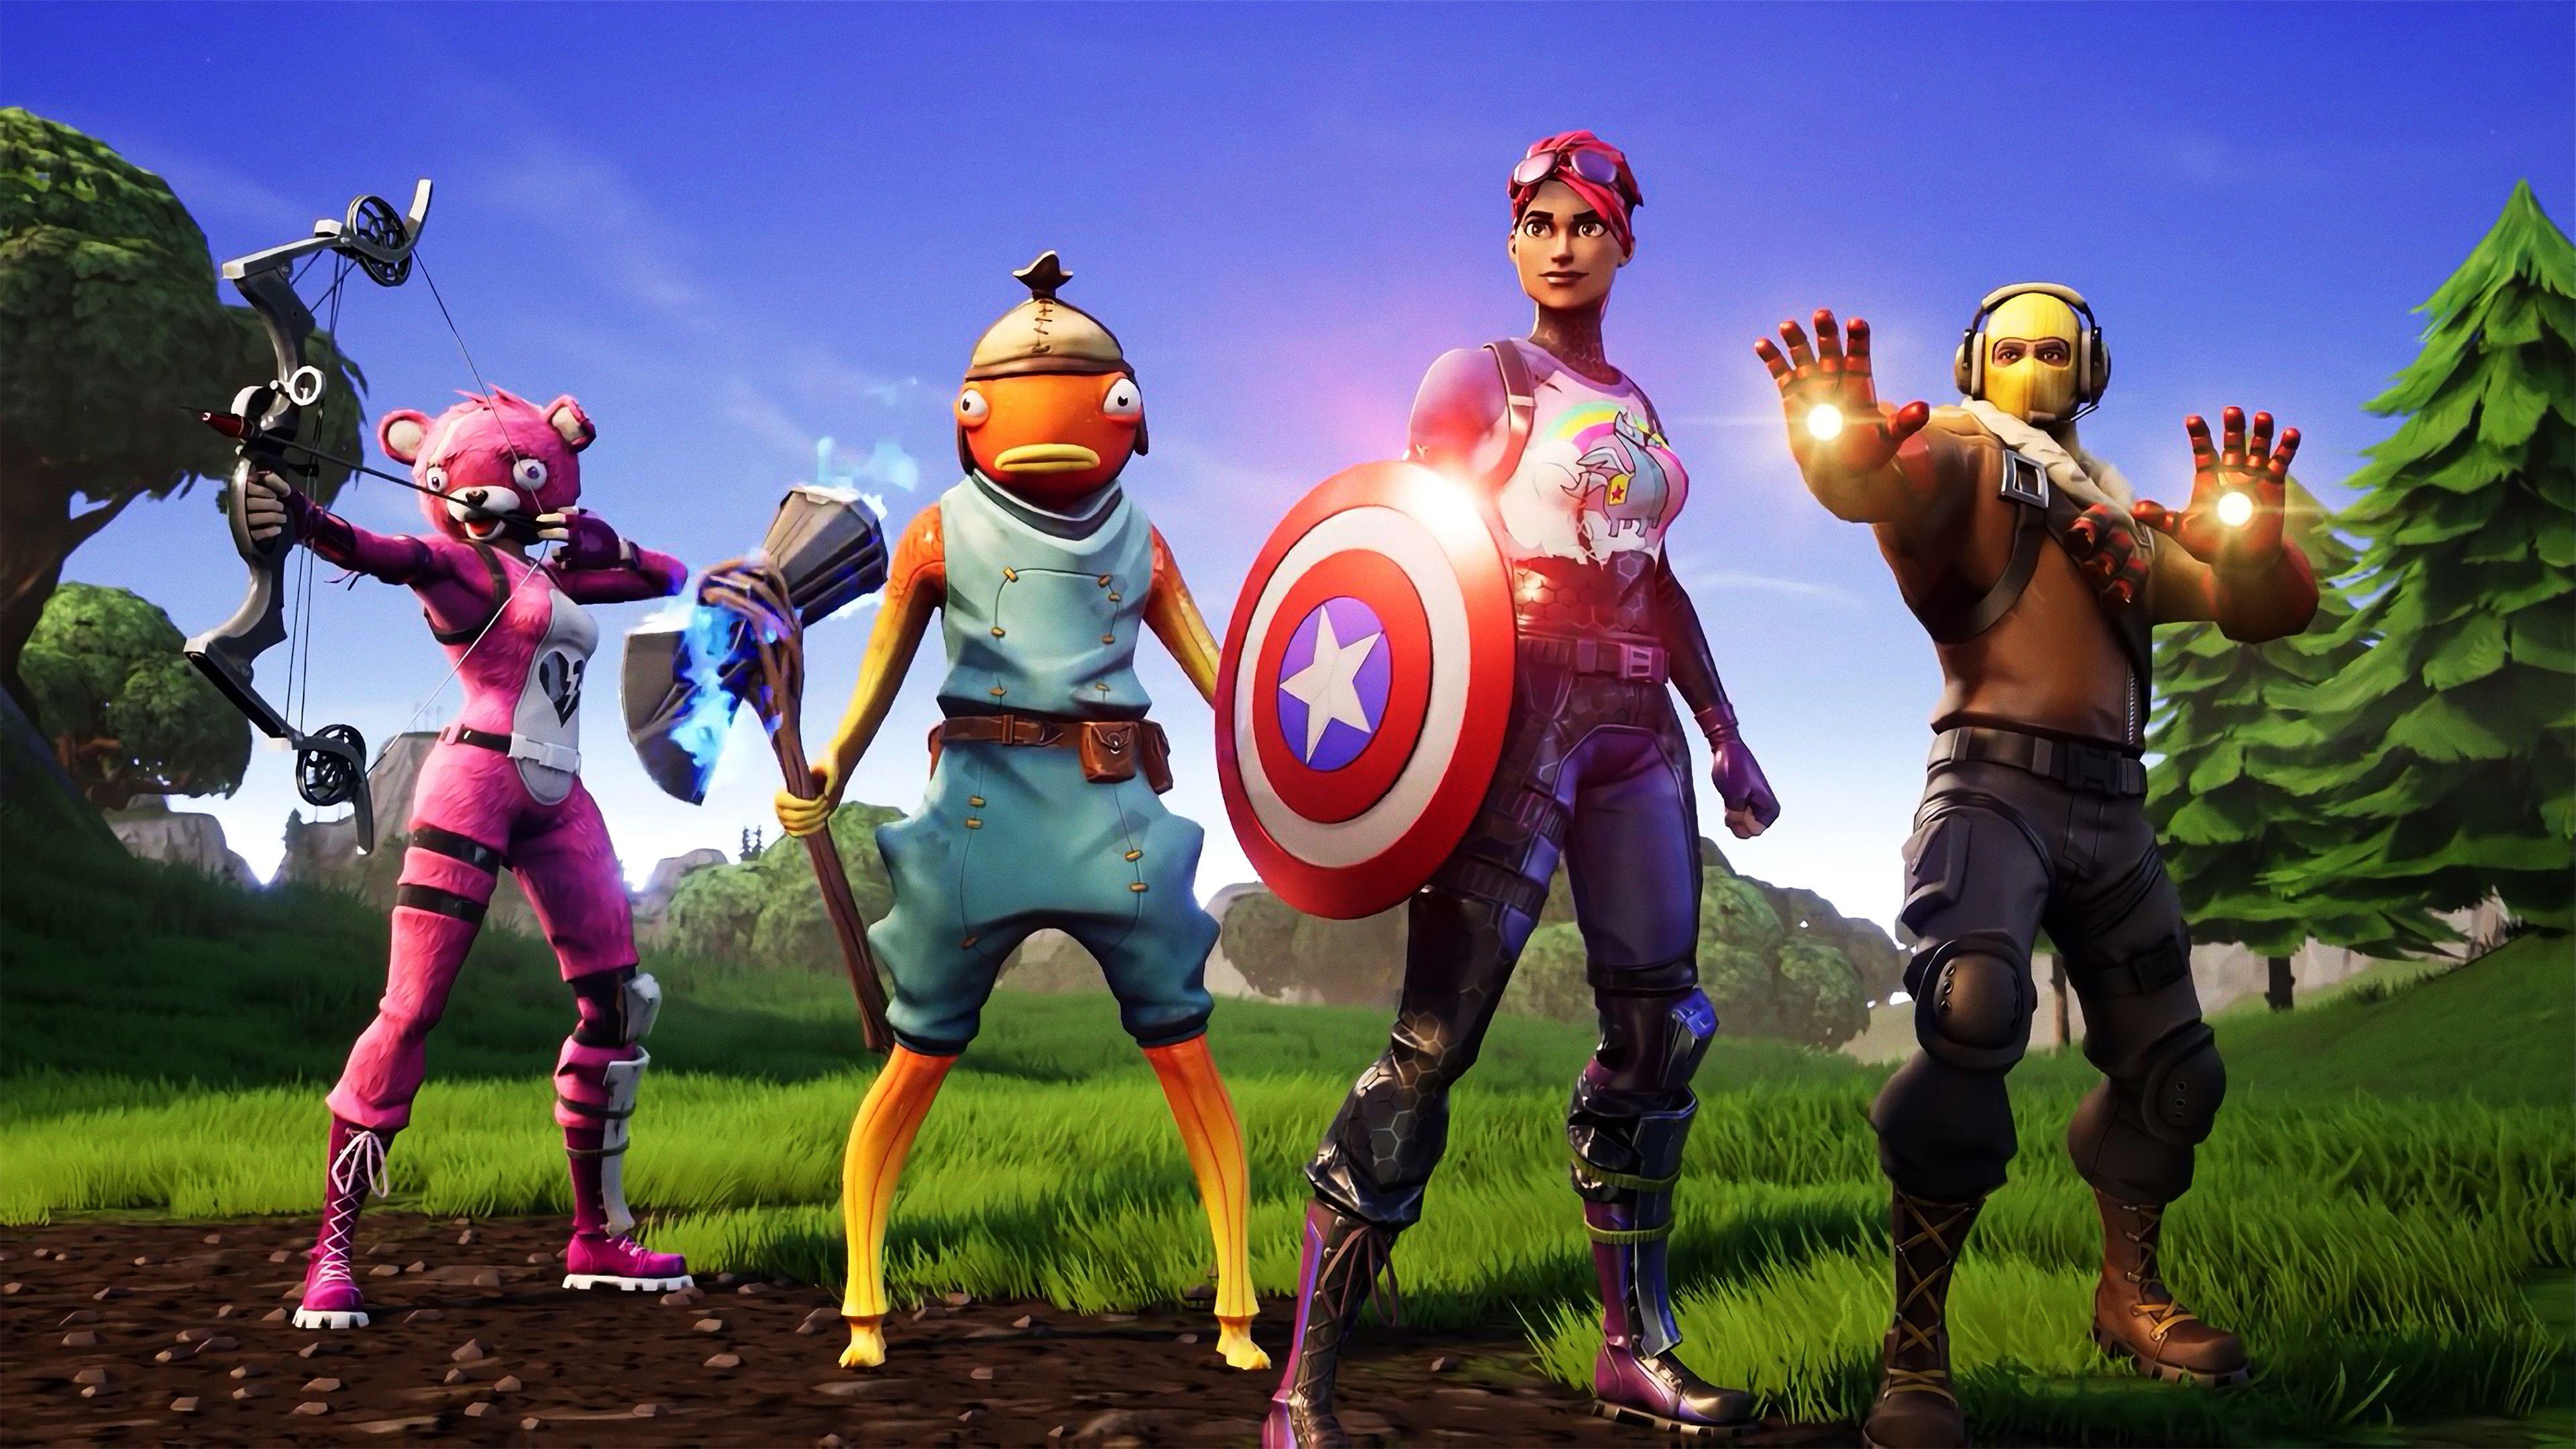 Avengers Fortnite X Superheroes Wallpapers Hd Wallpapers Fortnite Wallpapers Avengers Wallpapers 4k Wallpapers New Avengers Avengers Fortnite